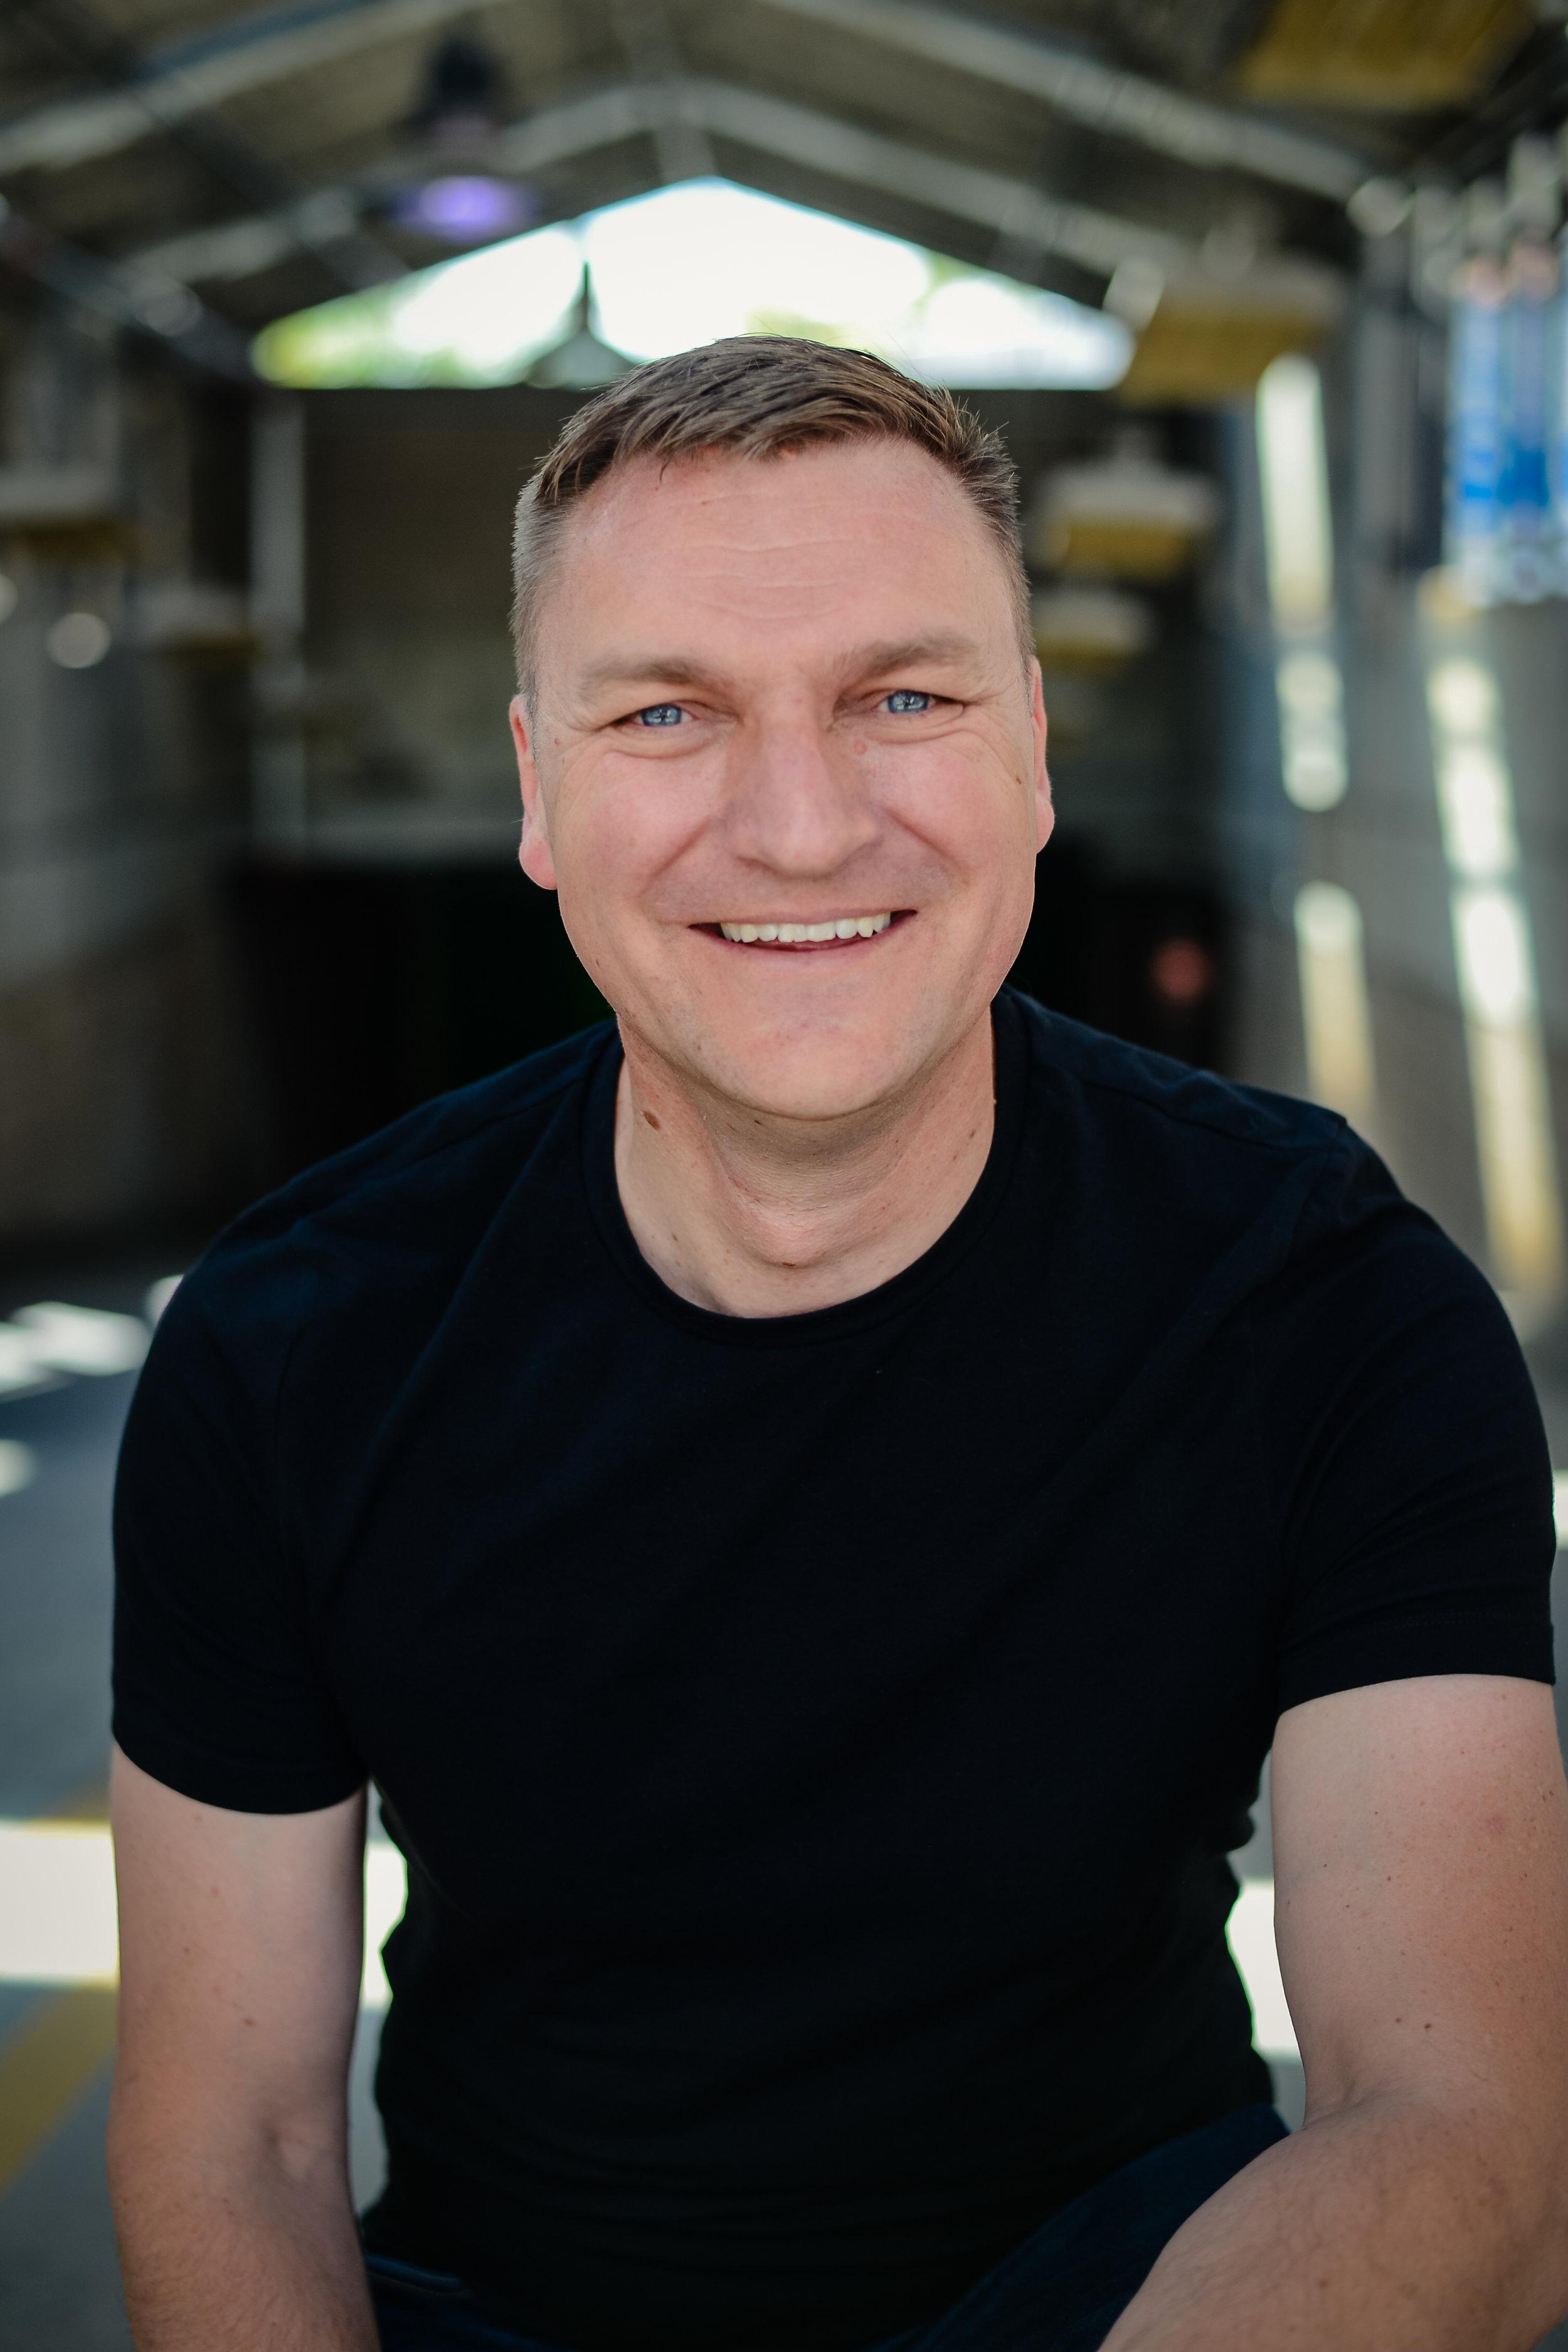 Steve Cuss - Lead Pastor